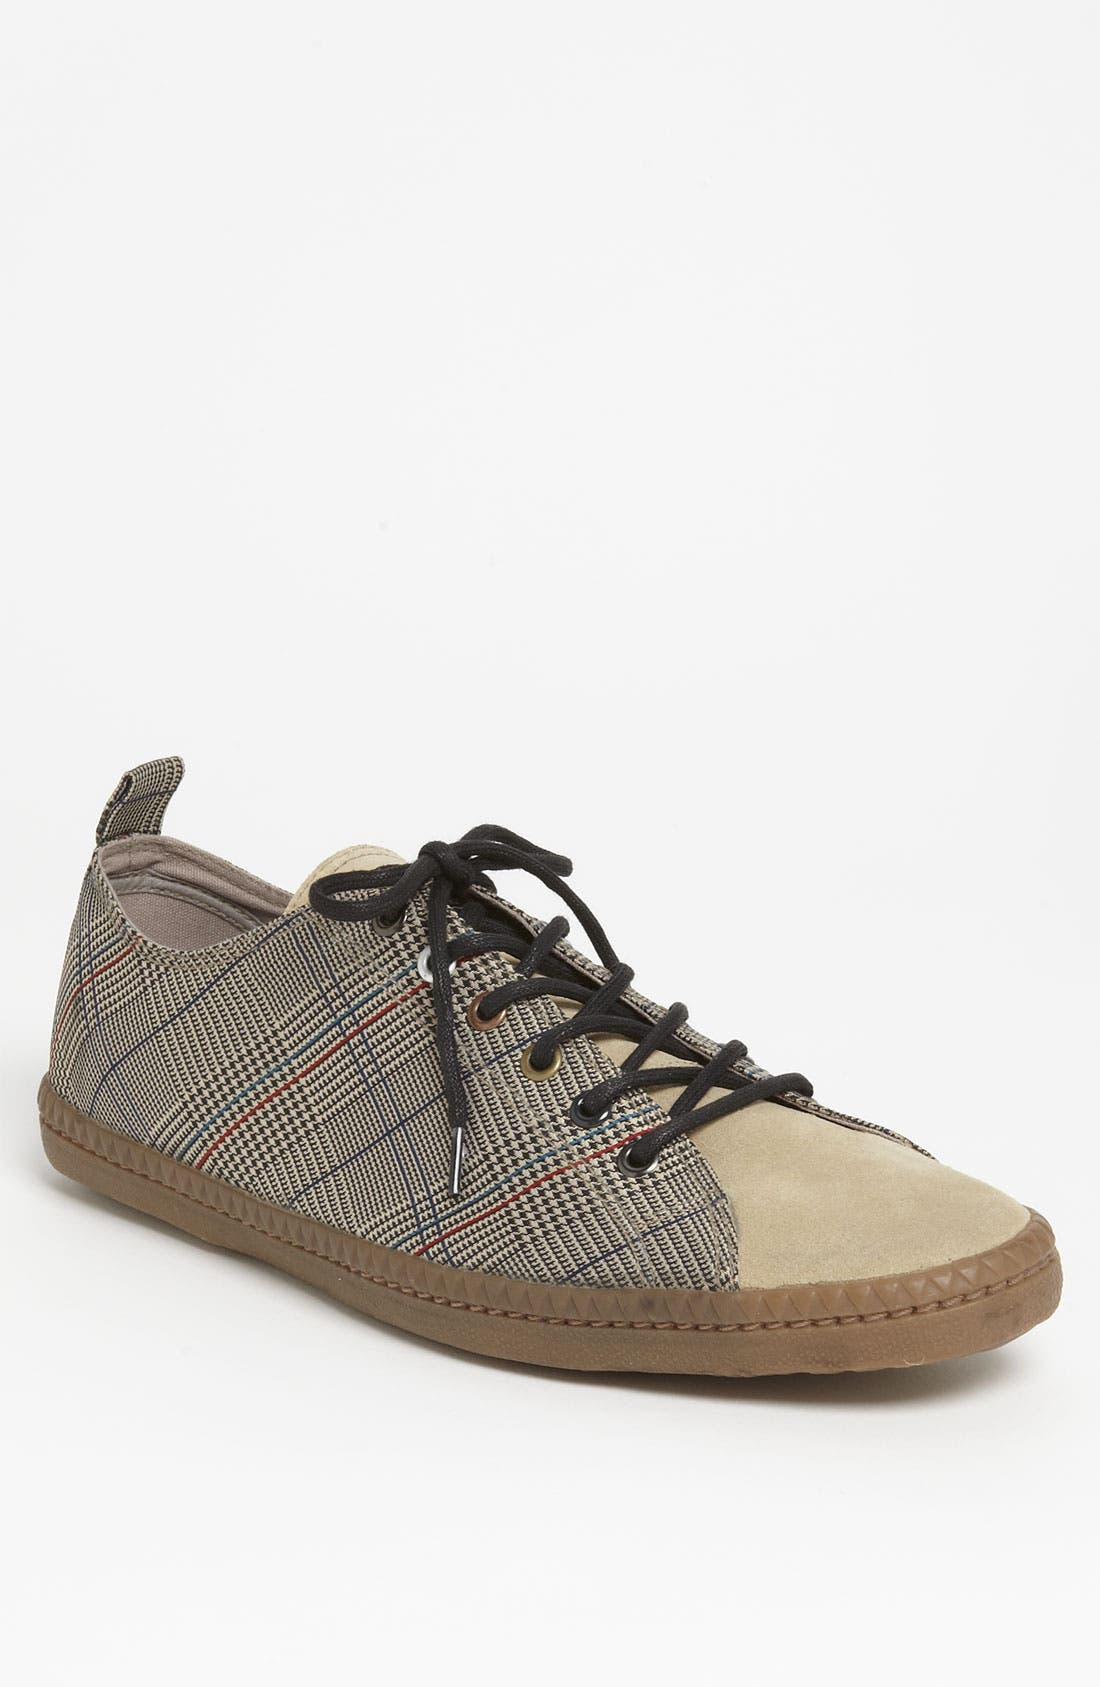 Alternate Image 1 Selected - Paul Smith 'Musa' Sneaker